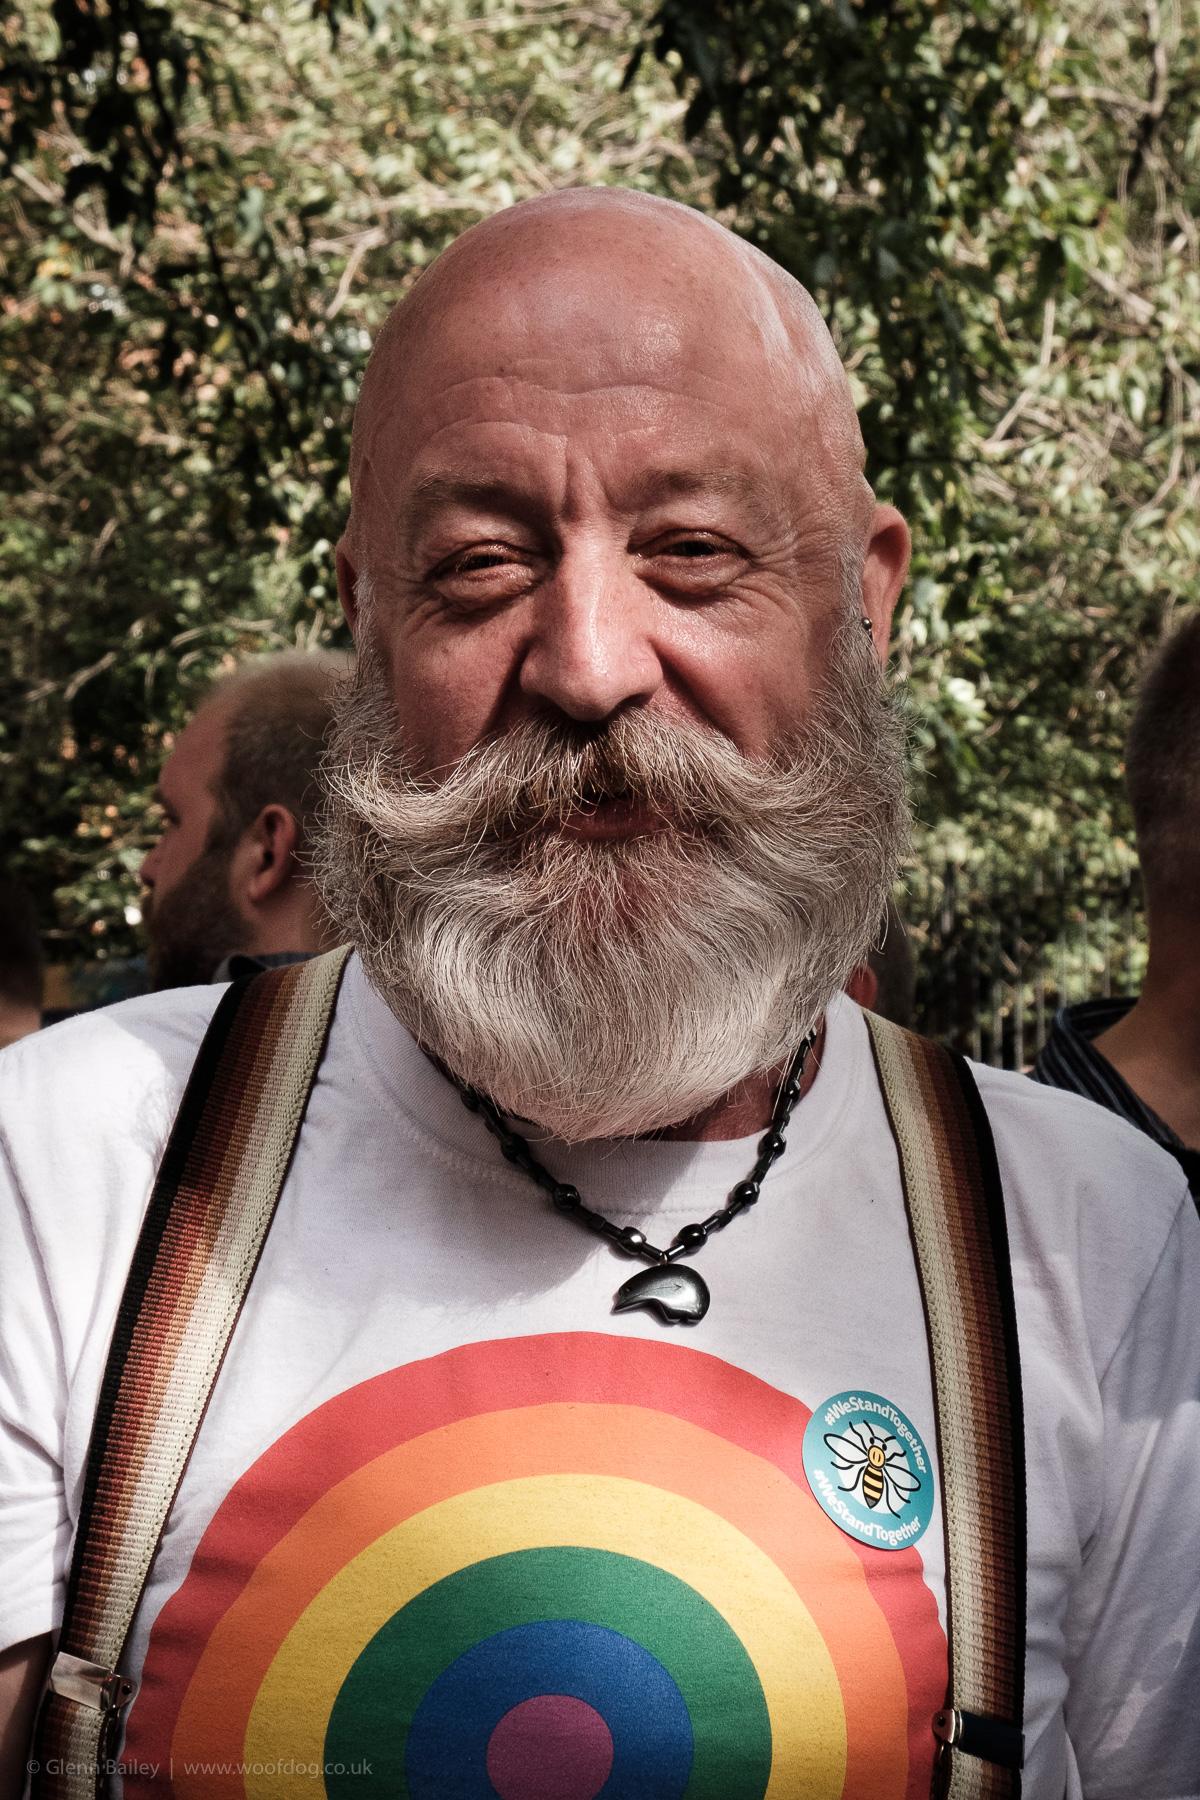 Manchester gay pride 2017